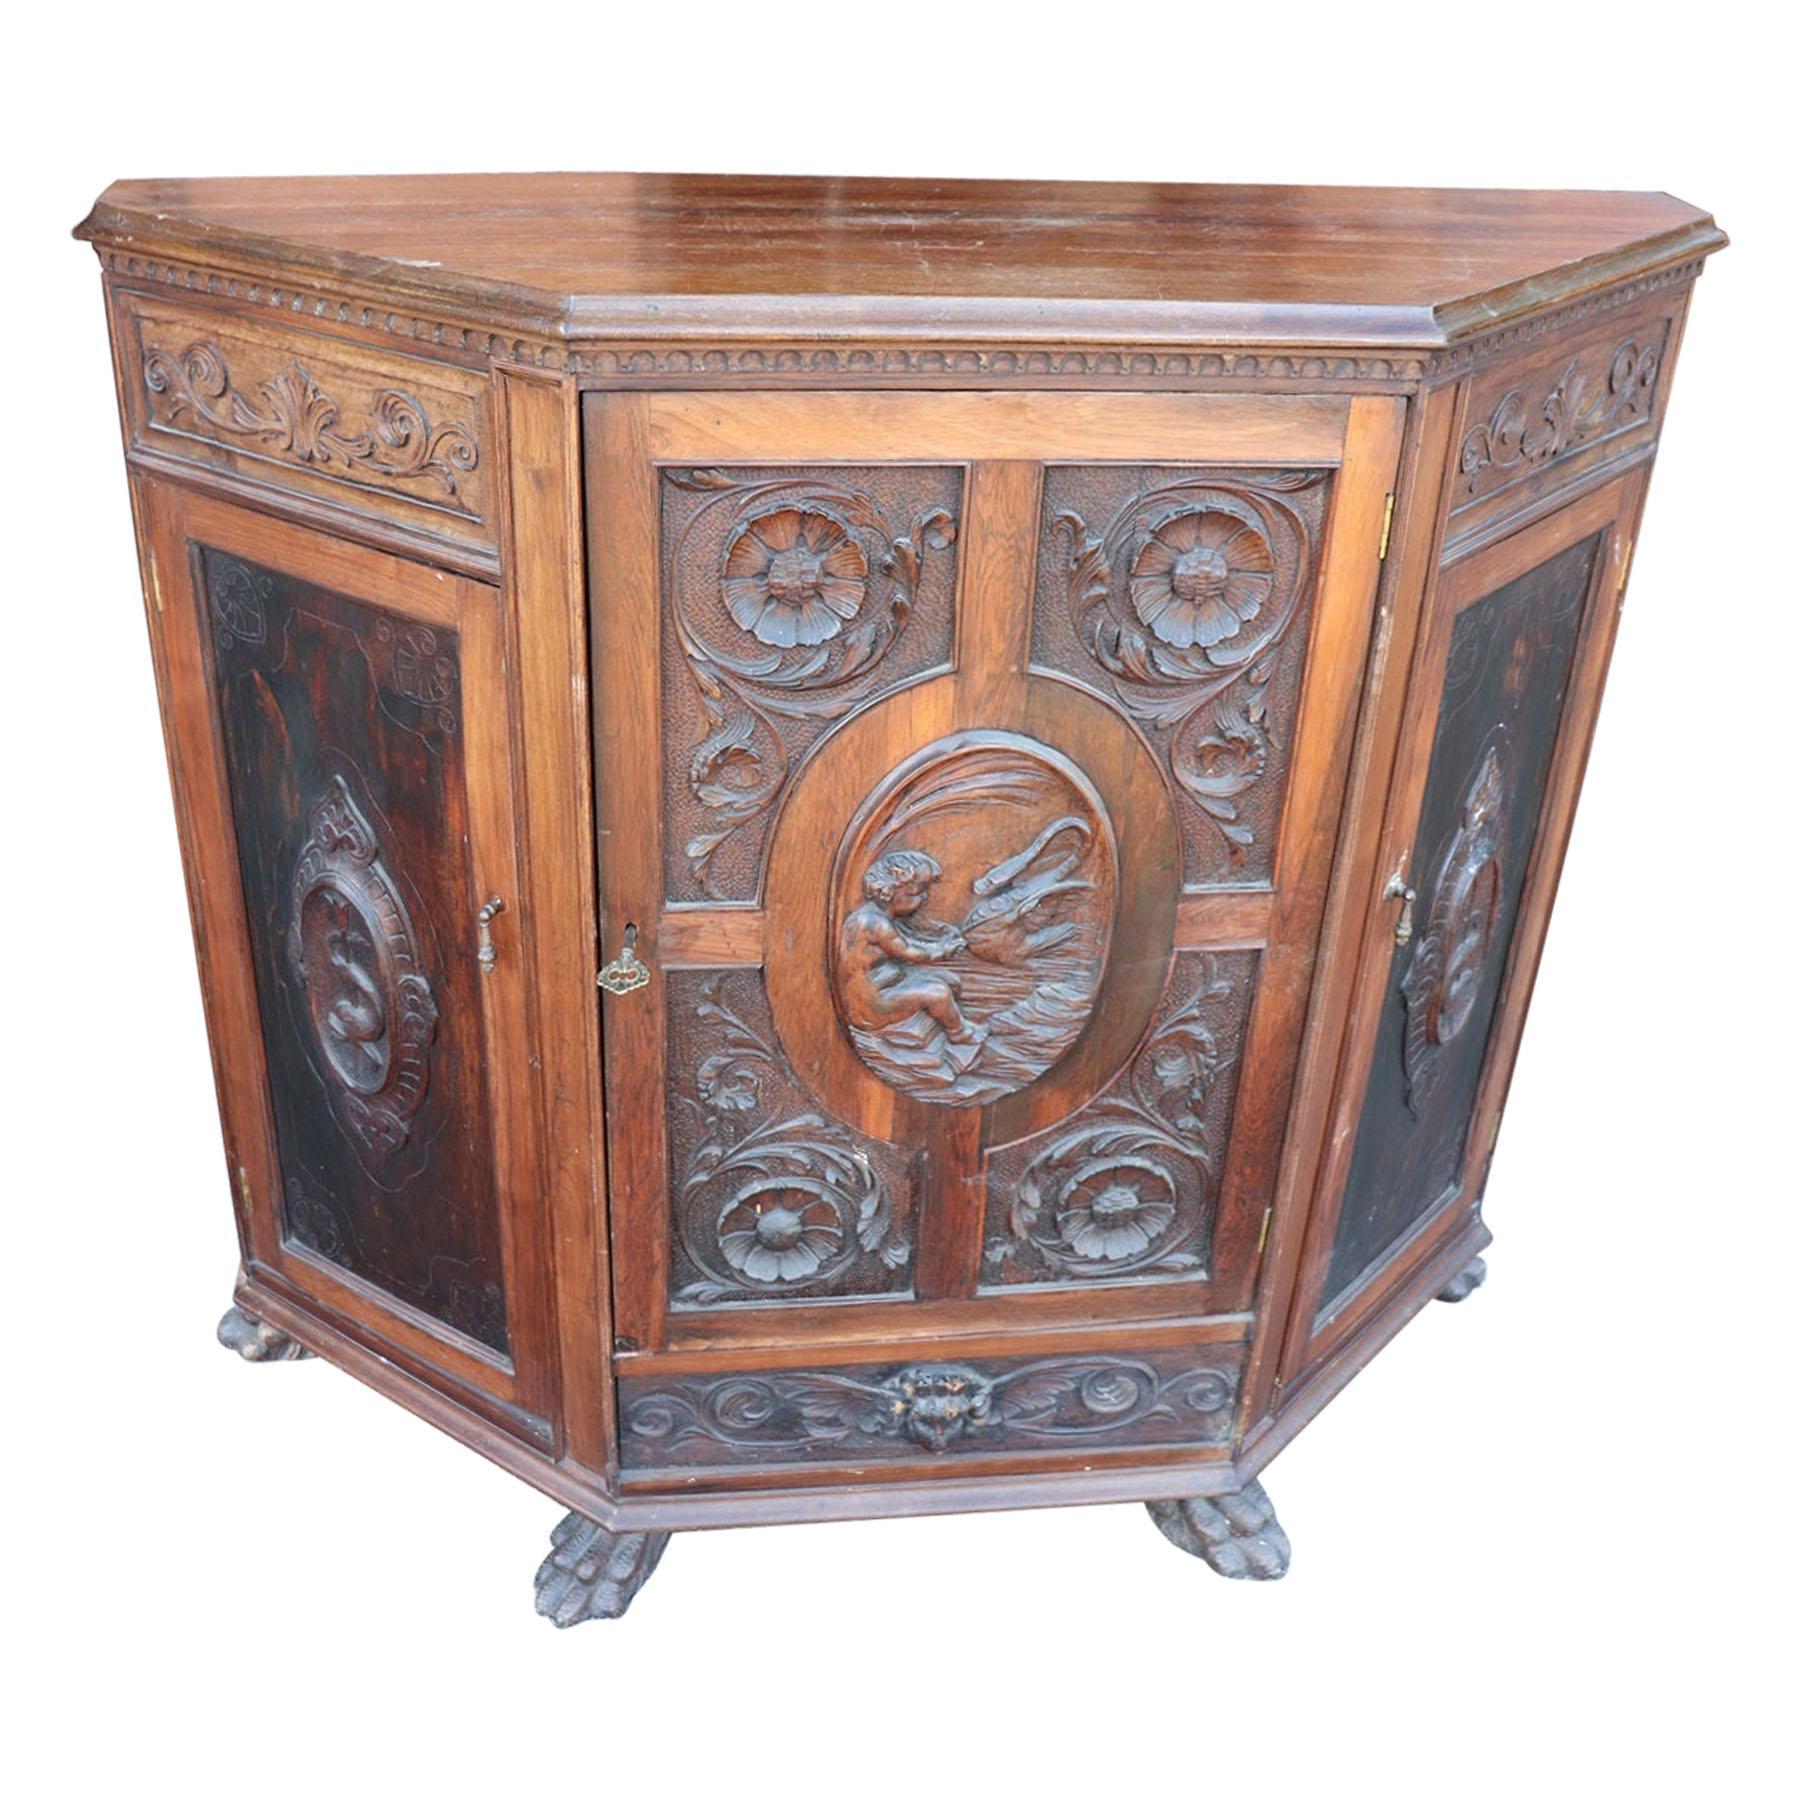 19th Century Italian Renaissance Style Carved Walnut Sideboard Buffet Credenza